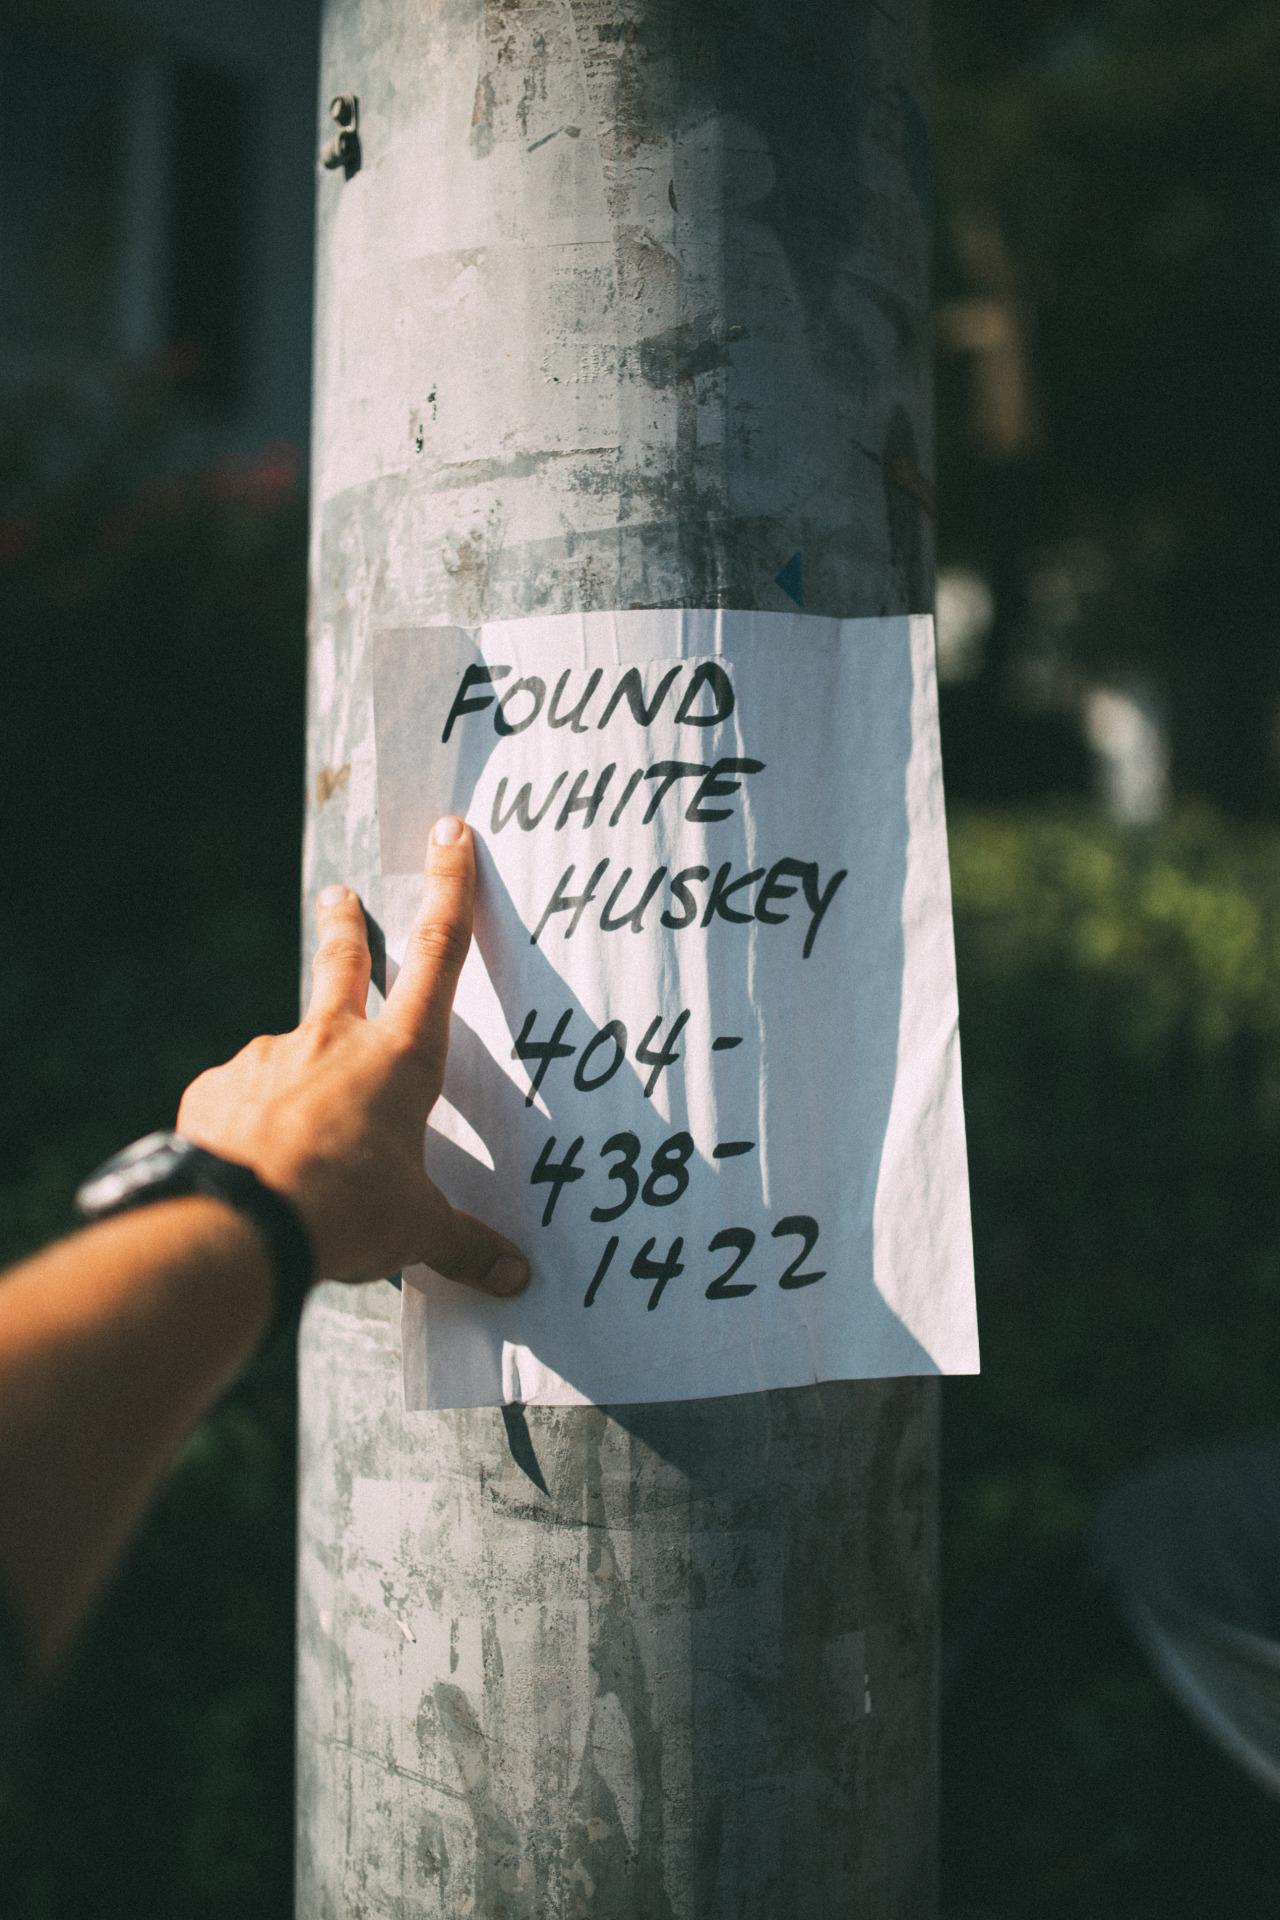 has anyone from Atanta, GA lost a white huskey?